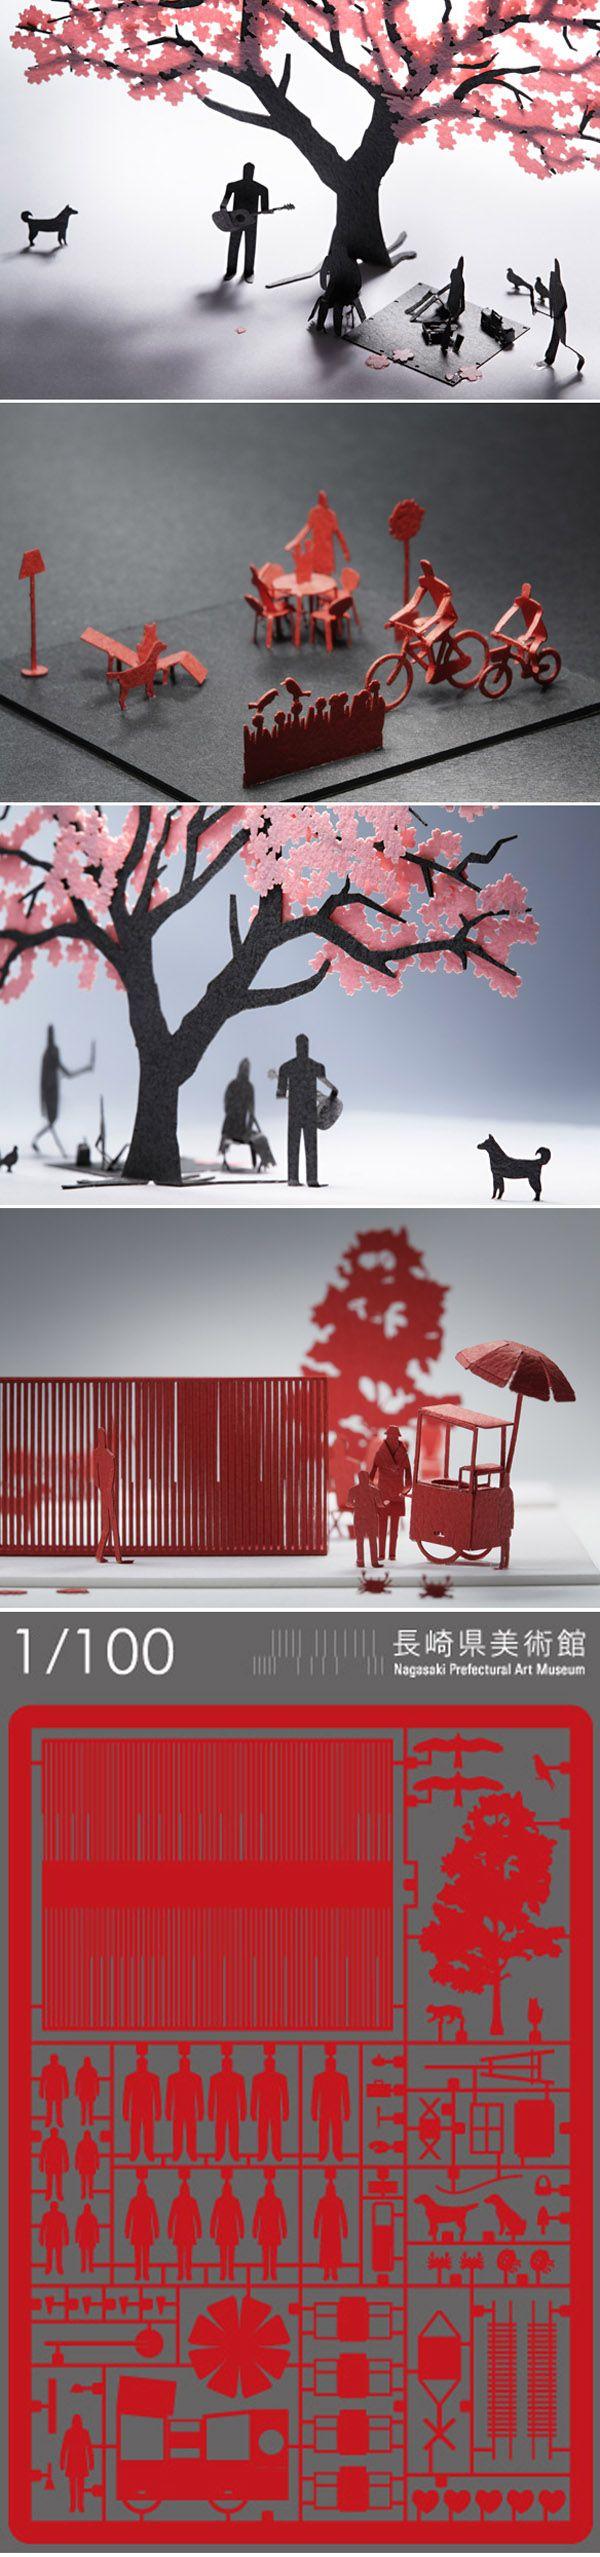 1/100 ARCHITECTURAL MODEL ACCESSORIES SERIES ( http://www.teradamokei.jp/en/ )